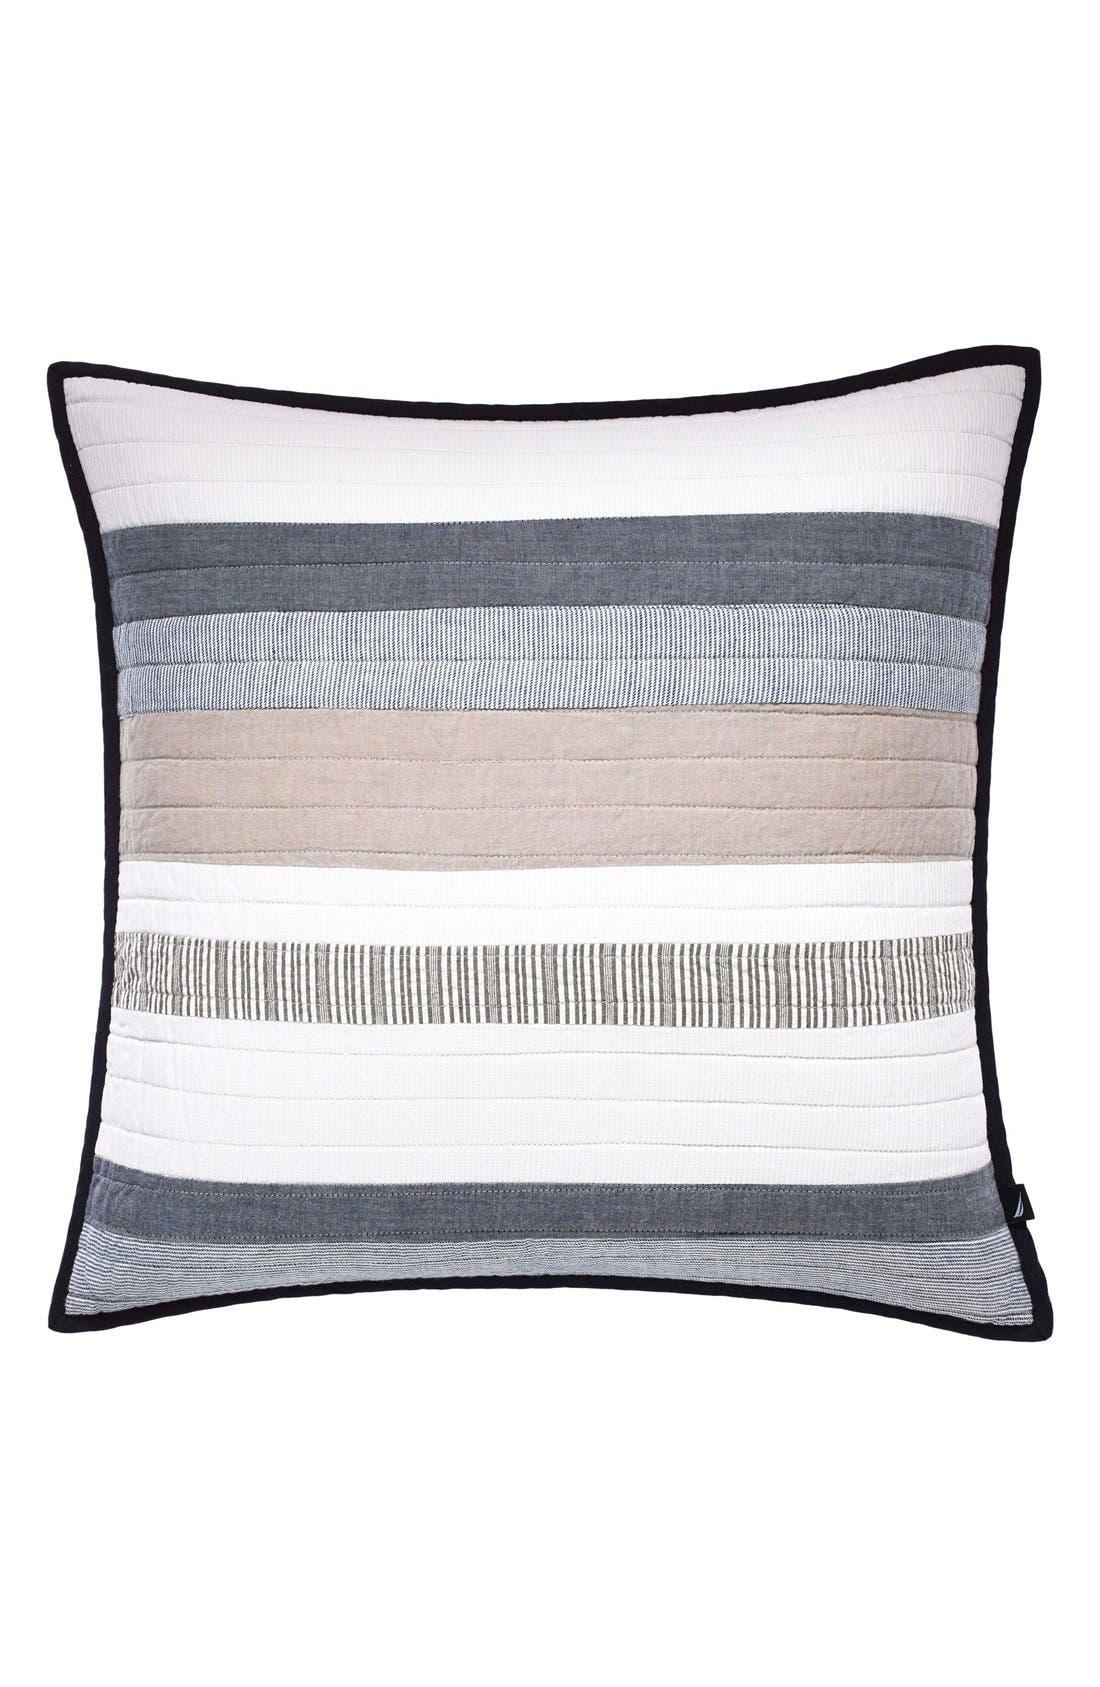 'Tideaway' Pillow,                             Main thumbnail 1, color,                             020